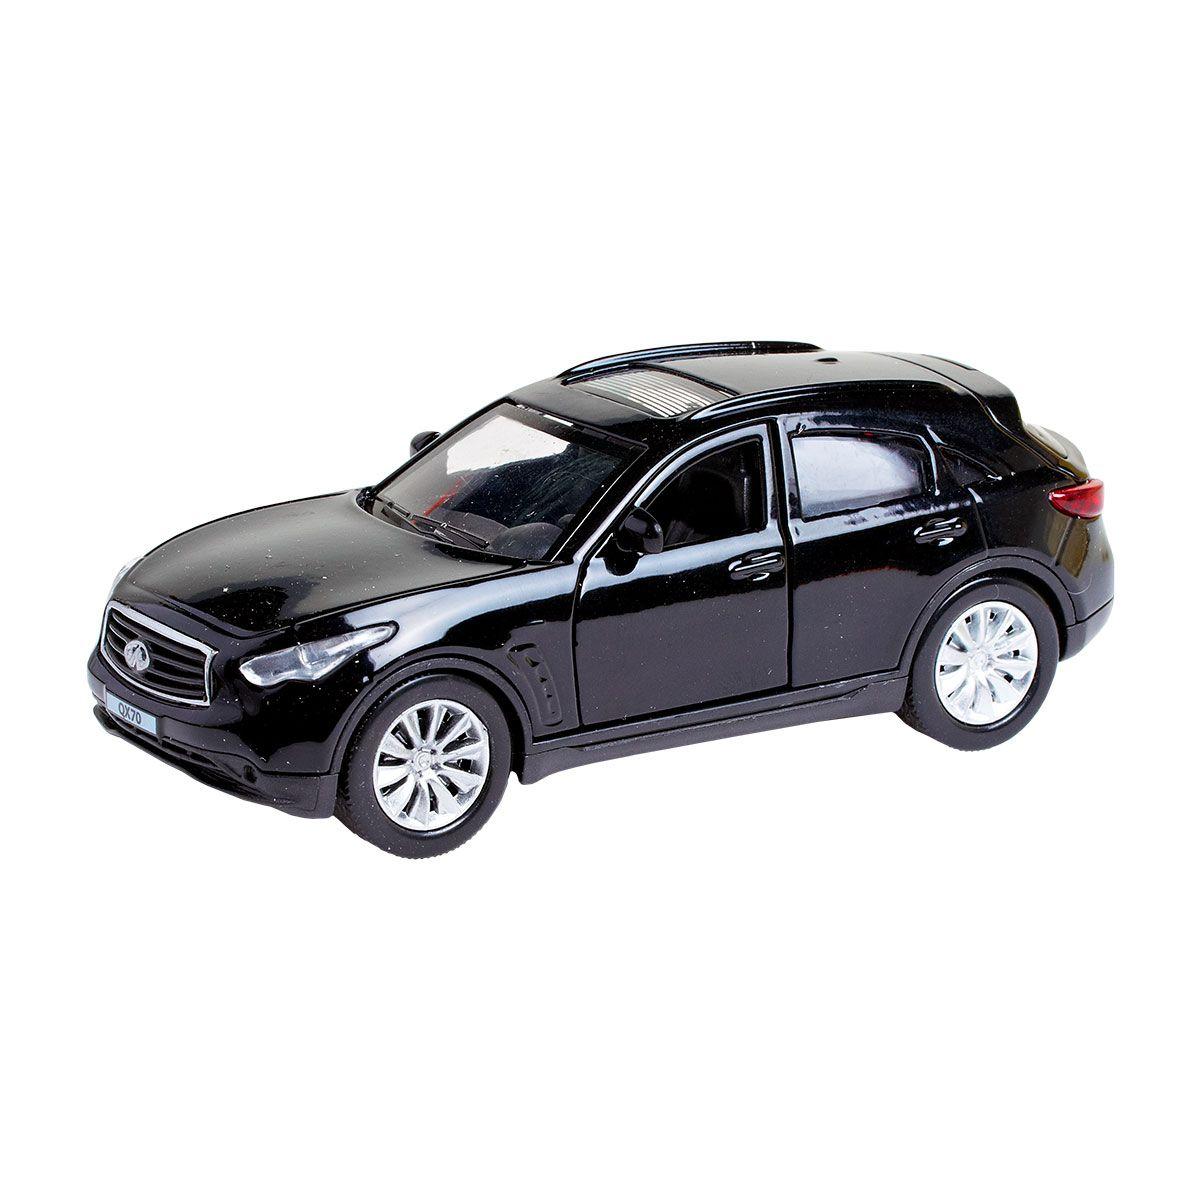 Автомодель INFINITI QX70